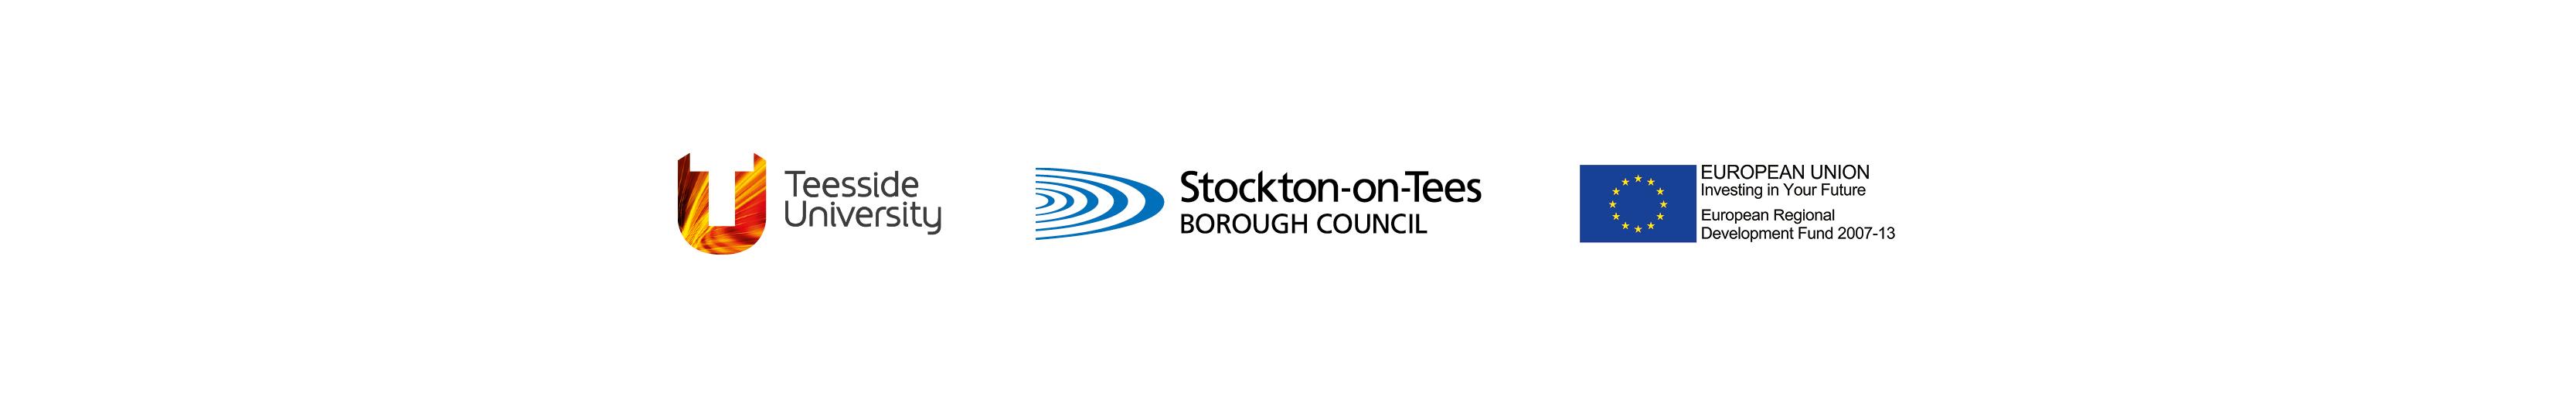 Teesside University, Stockton-on-Tees Borough Council, European Union